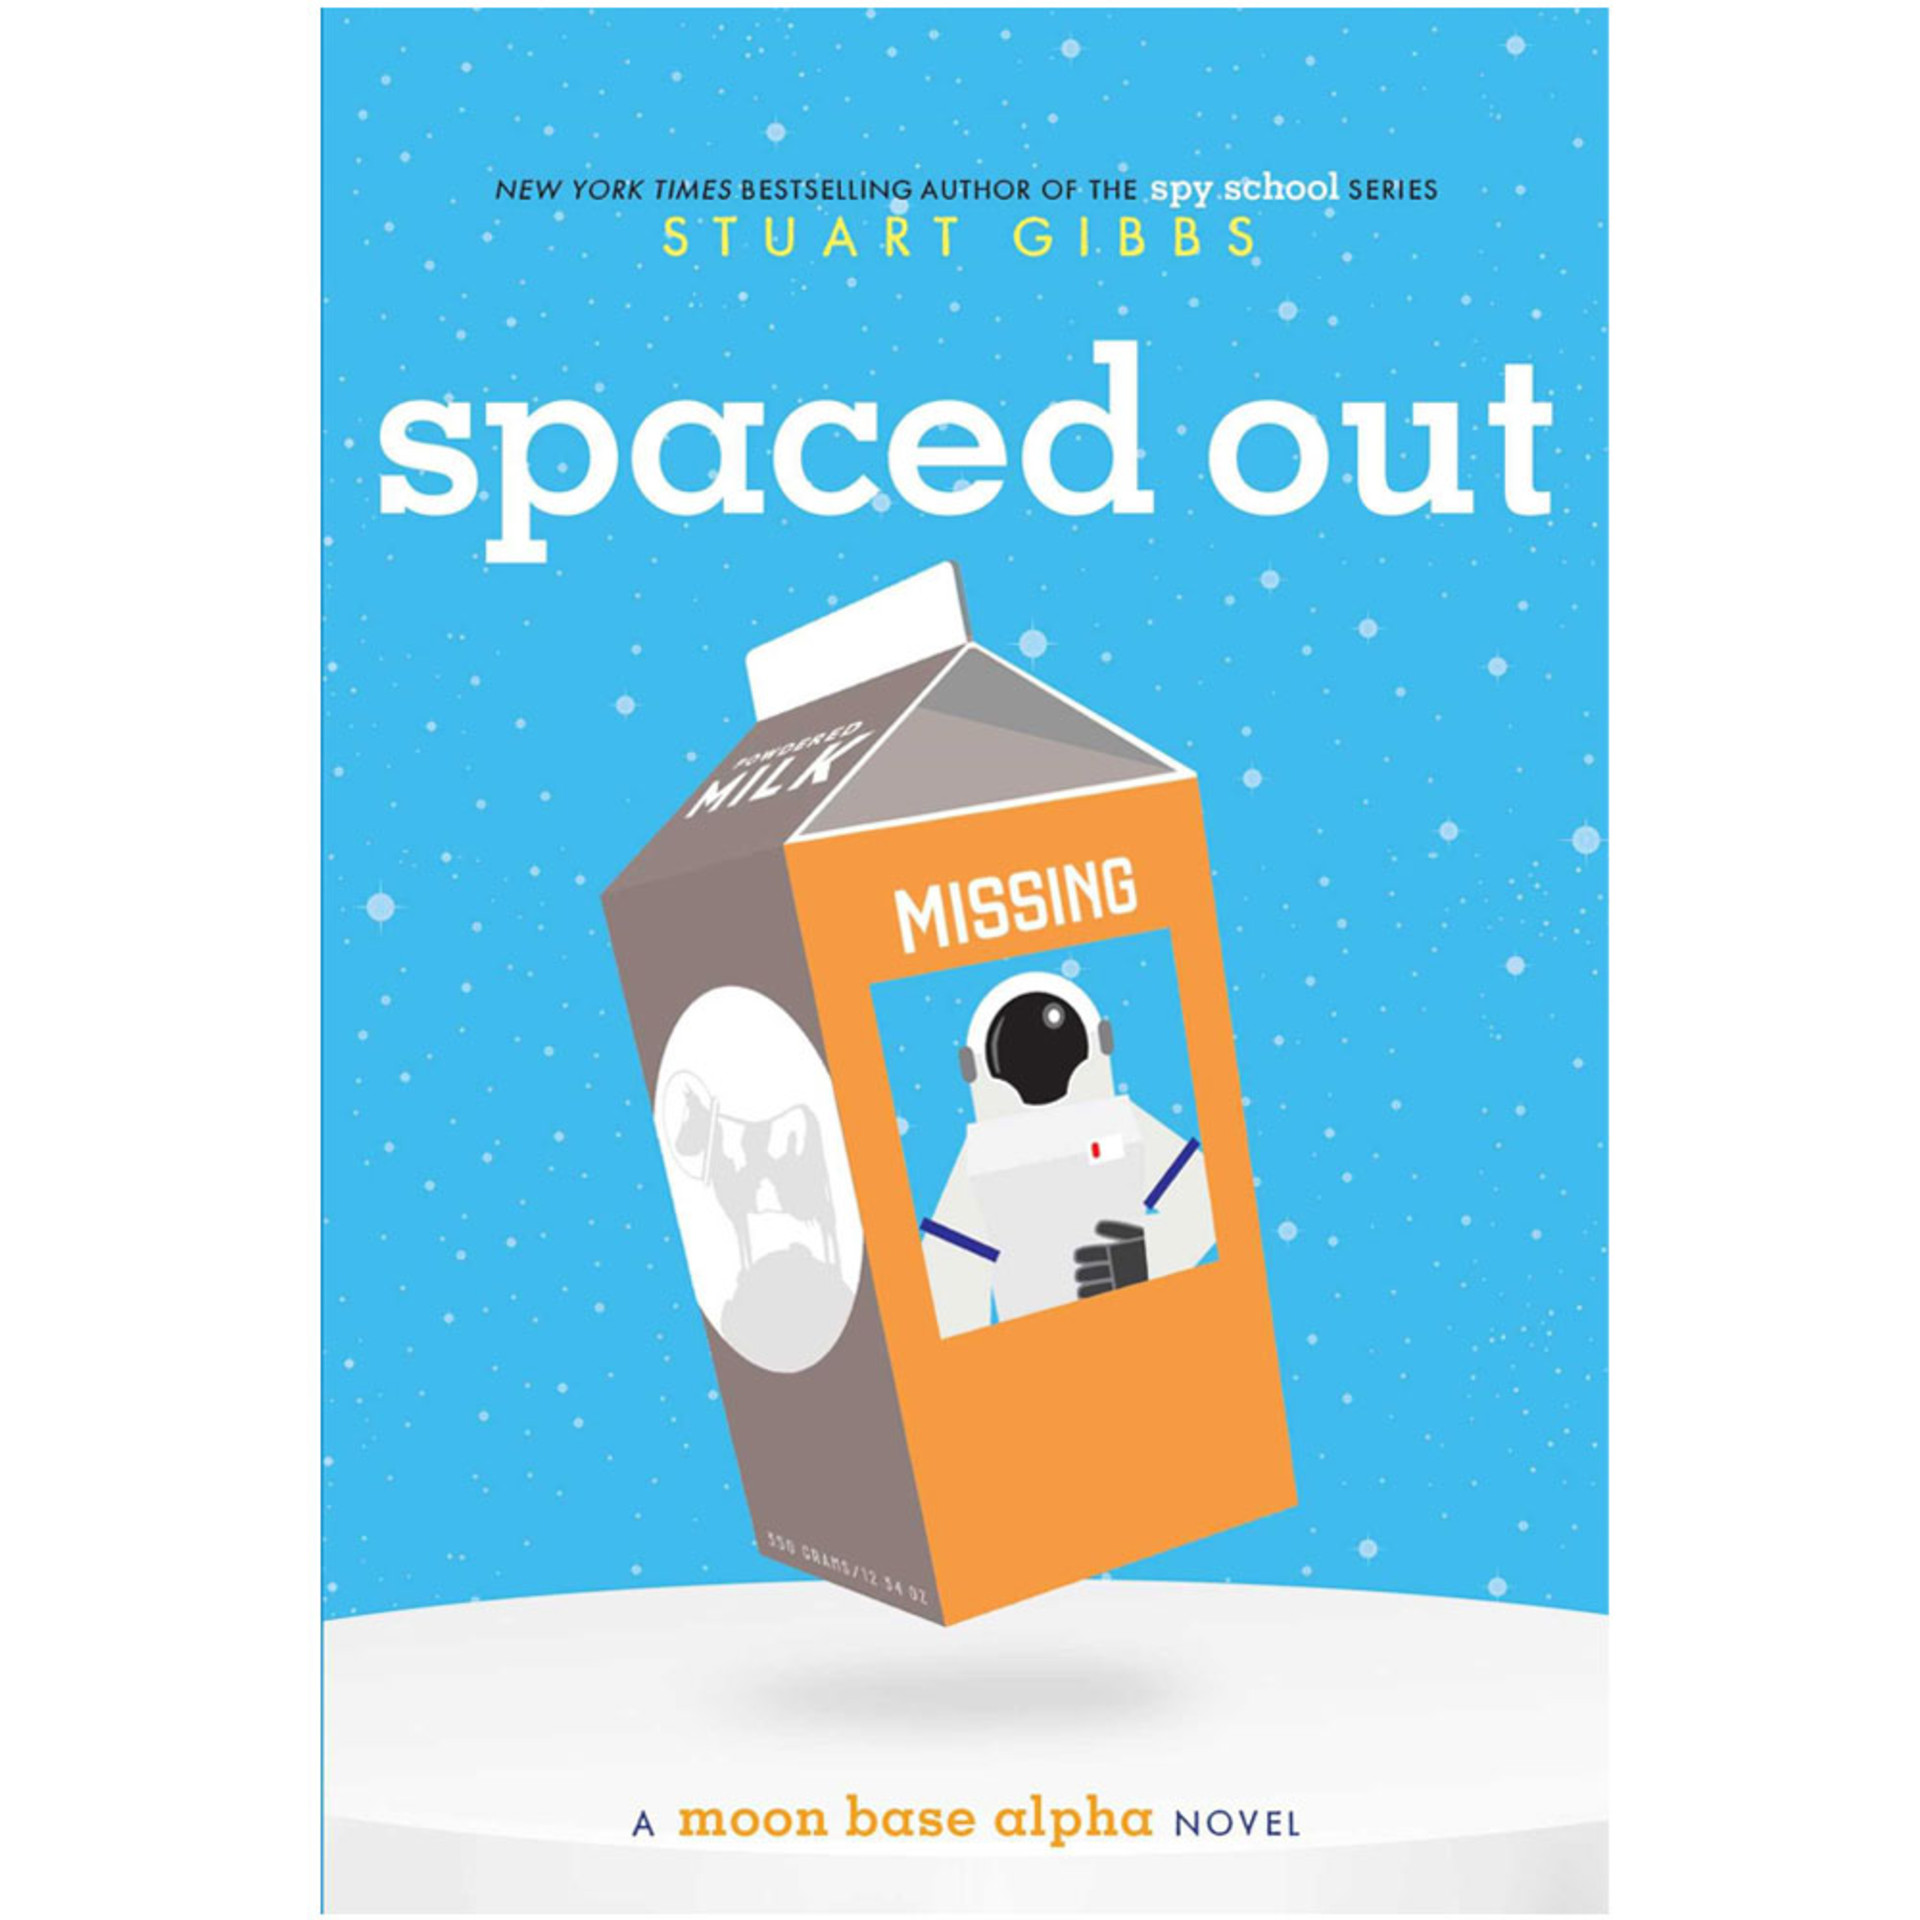 Spaced Out: A Moon Base Alpha Novel by Stuart Gibbs